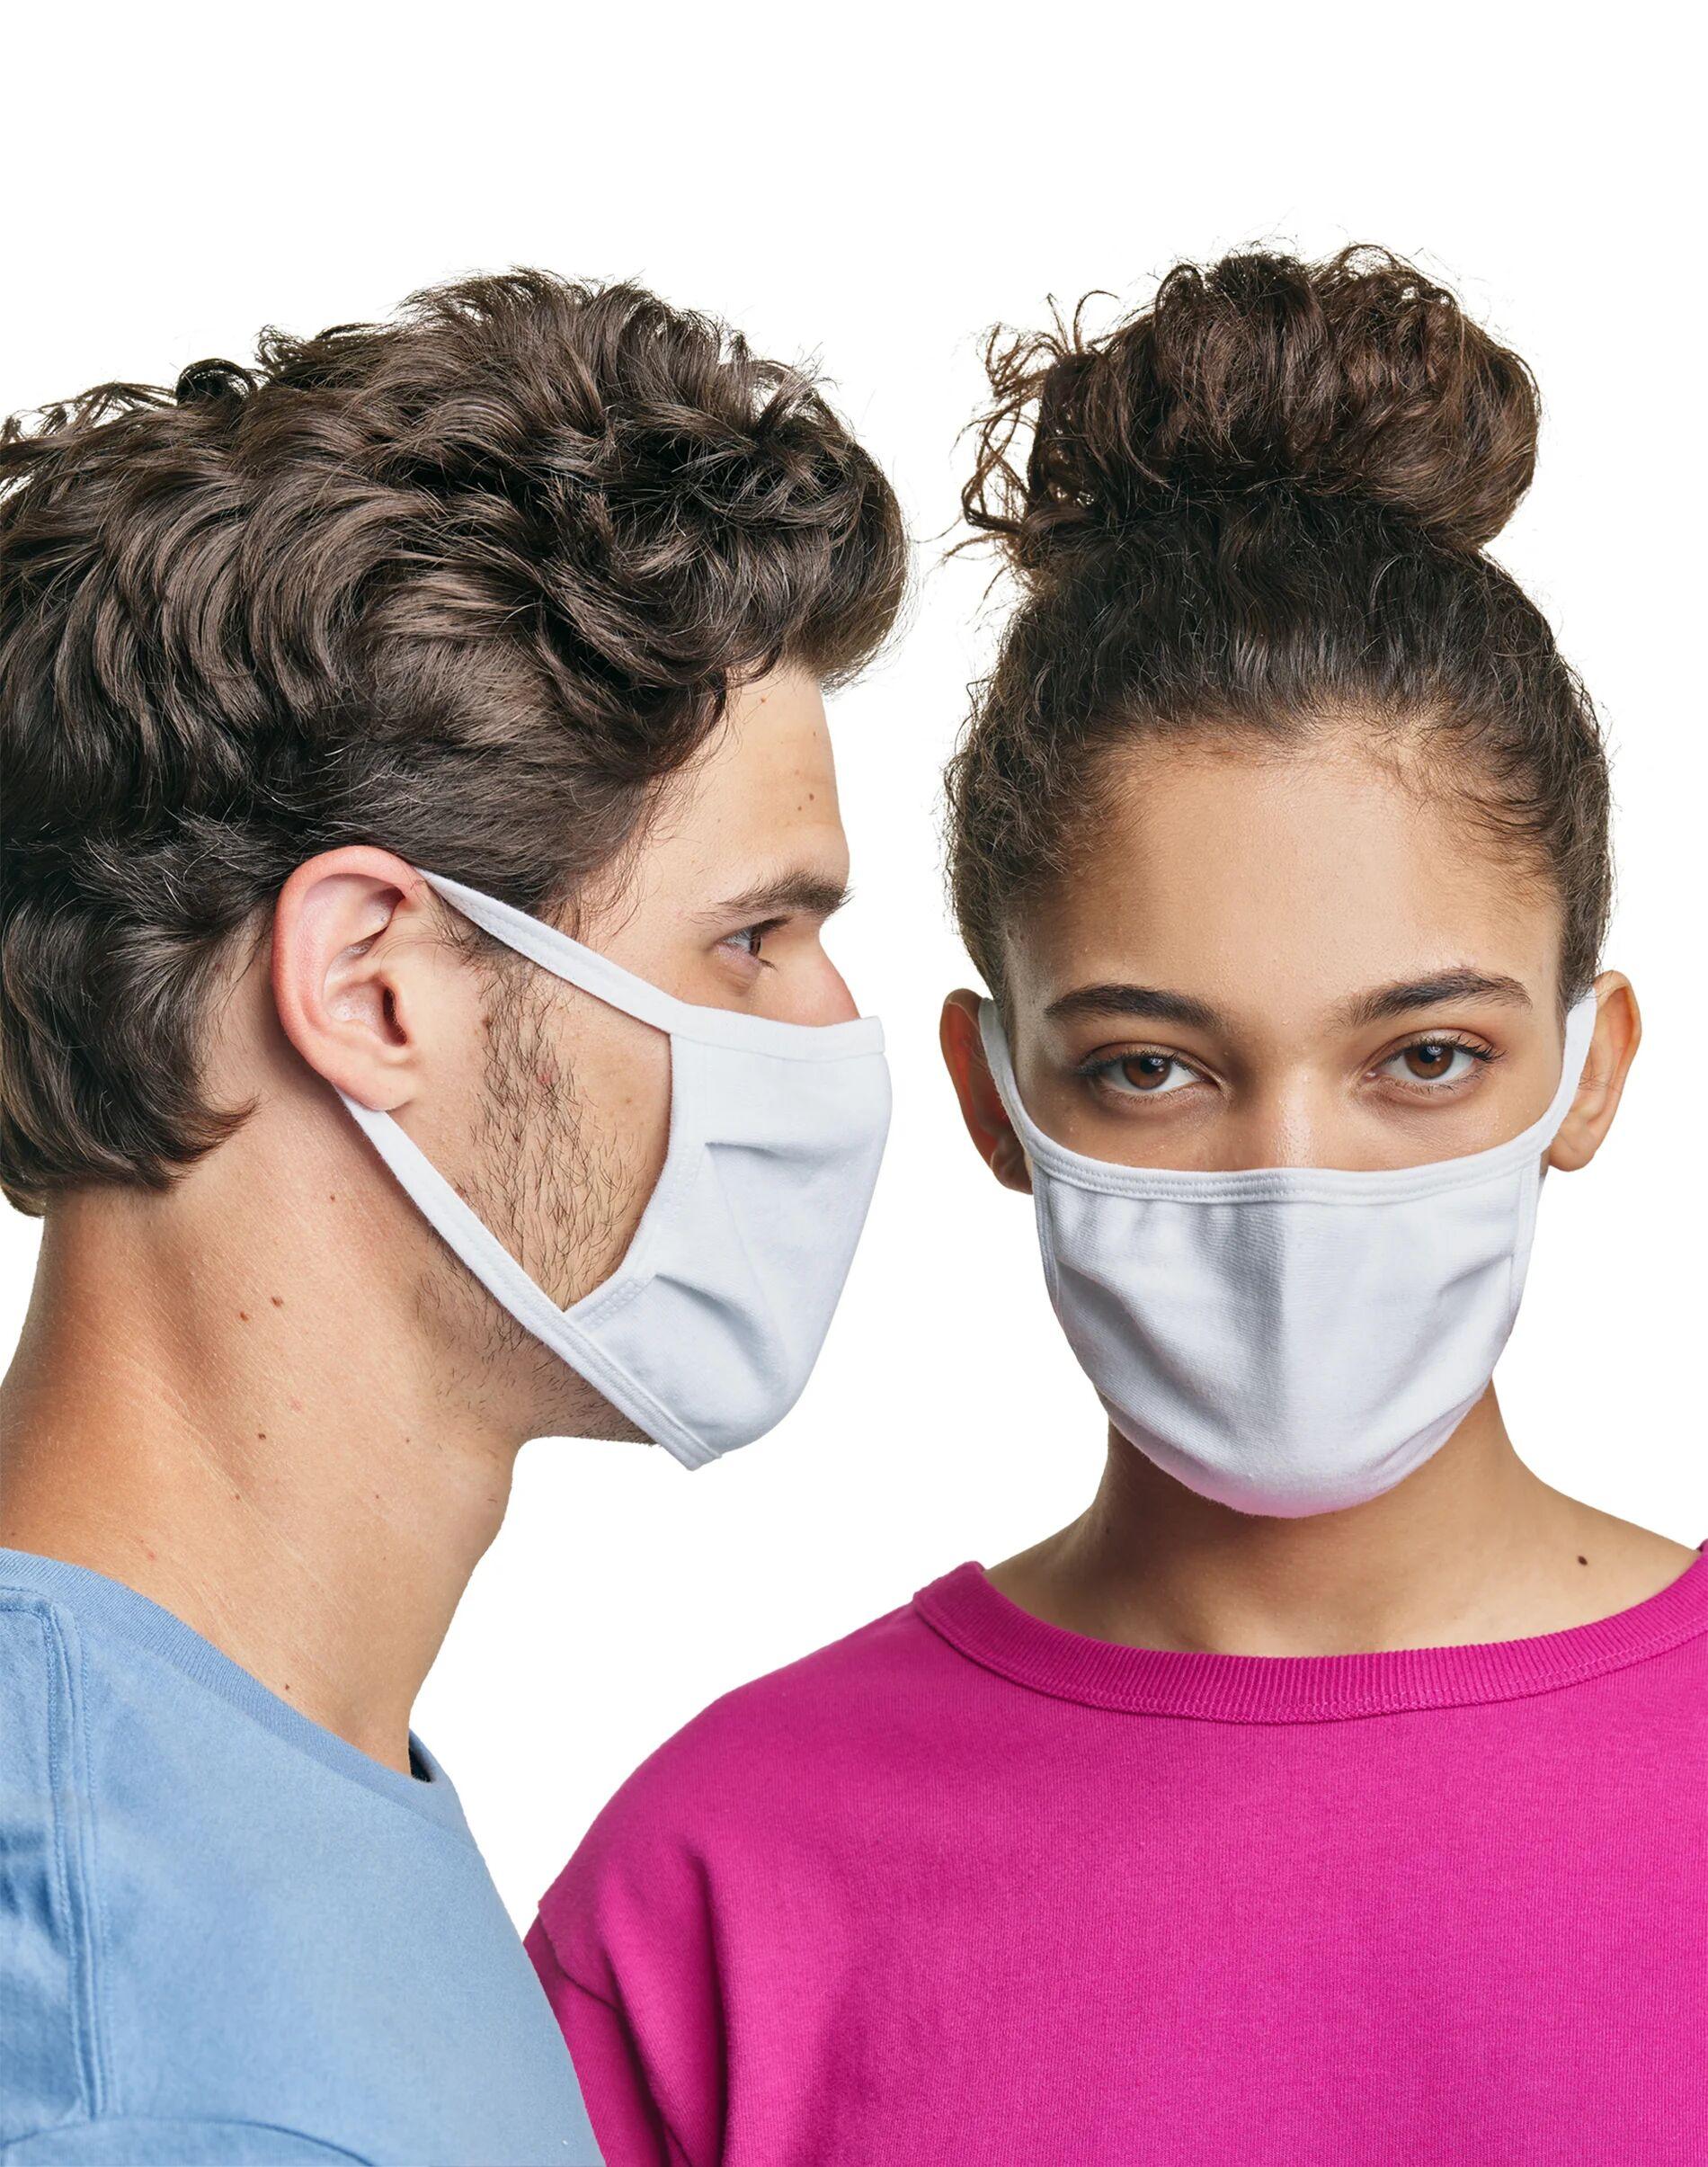 Hanes Wicking Cotton Masks, 50-Pack White Unisex